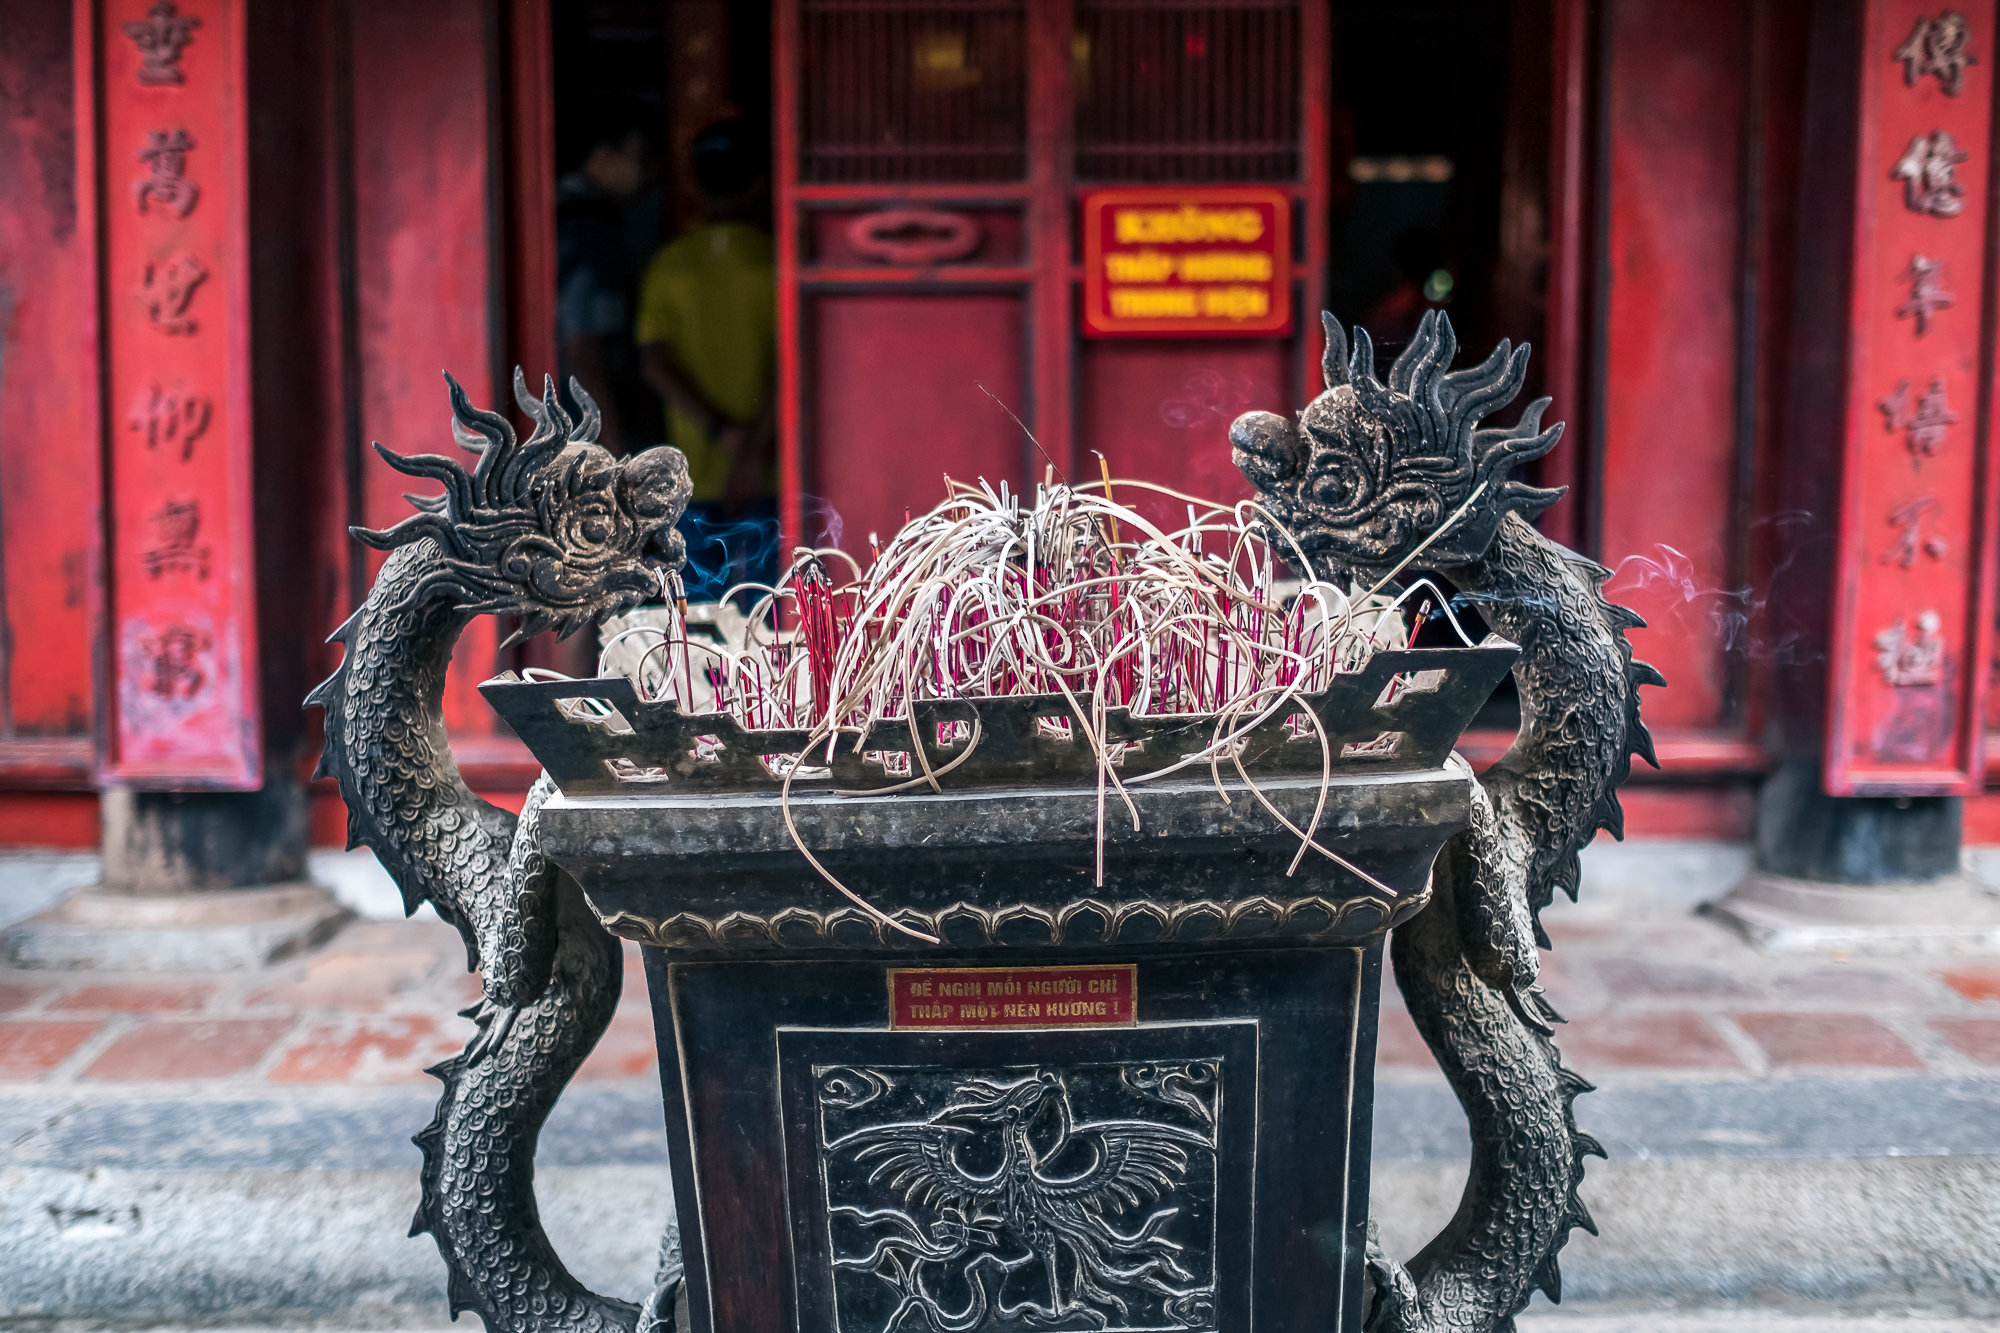 Vietnam_Honeymoon_TheOutsiderBlog_DSCF8014.JPG